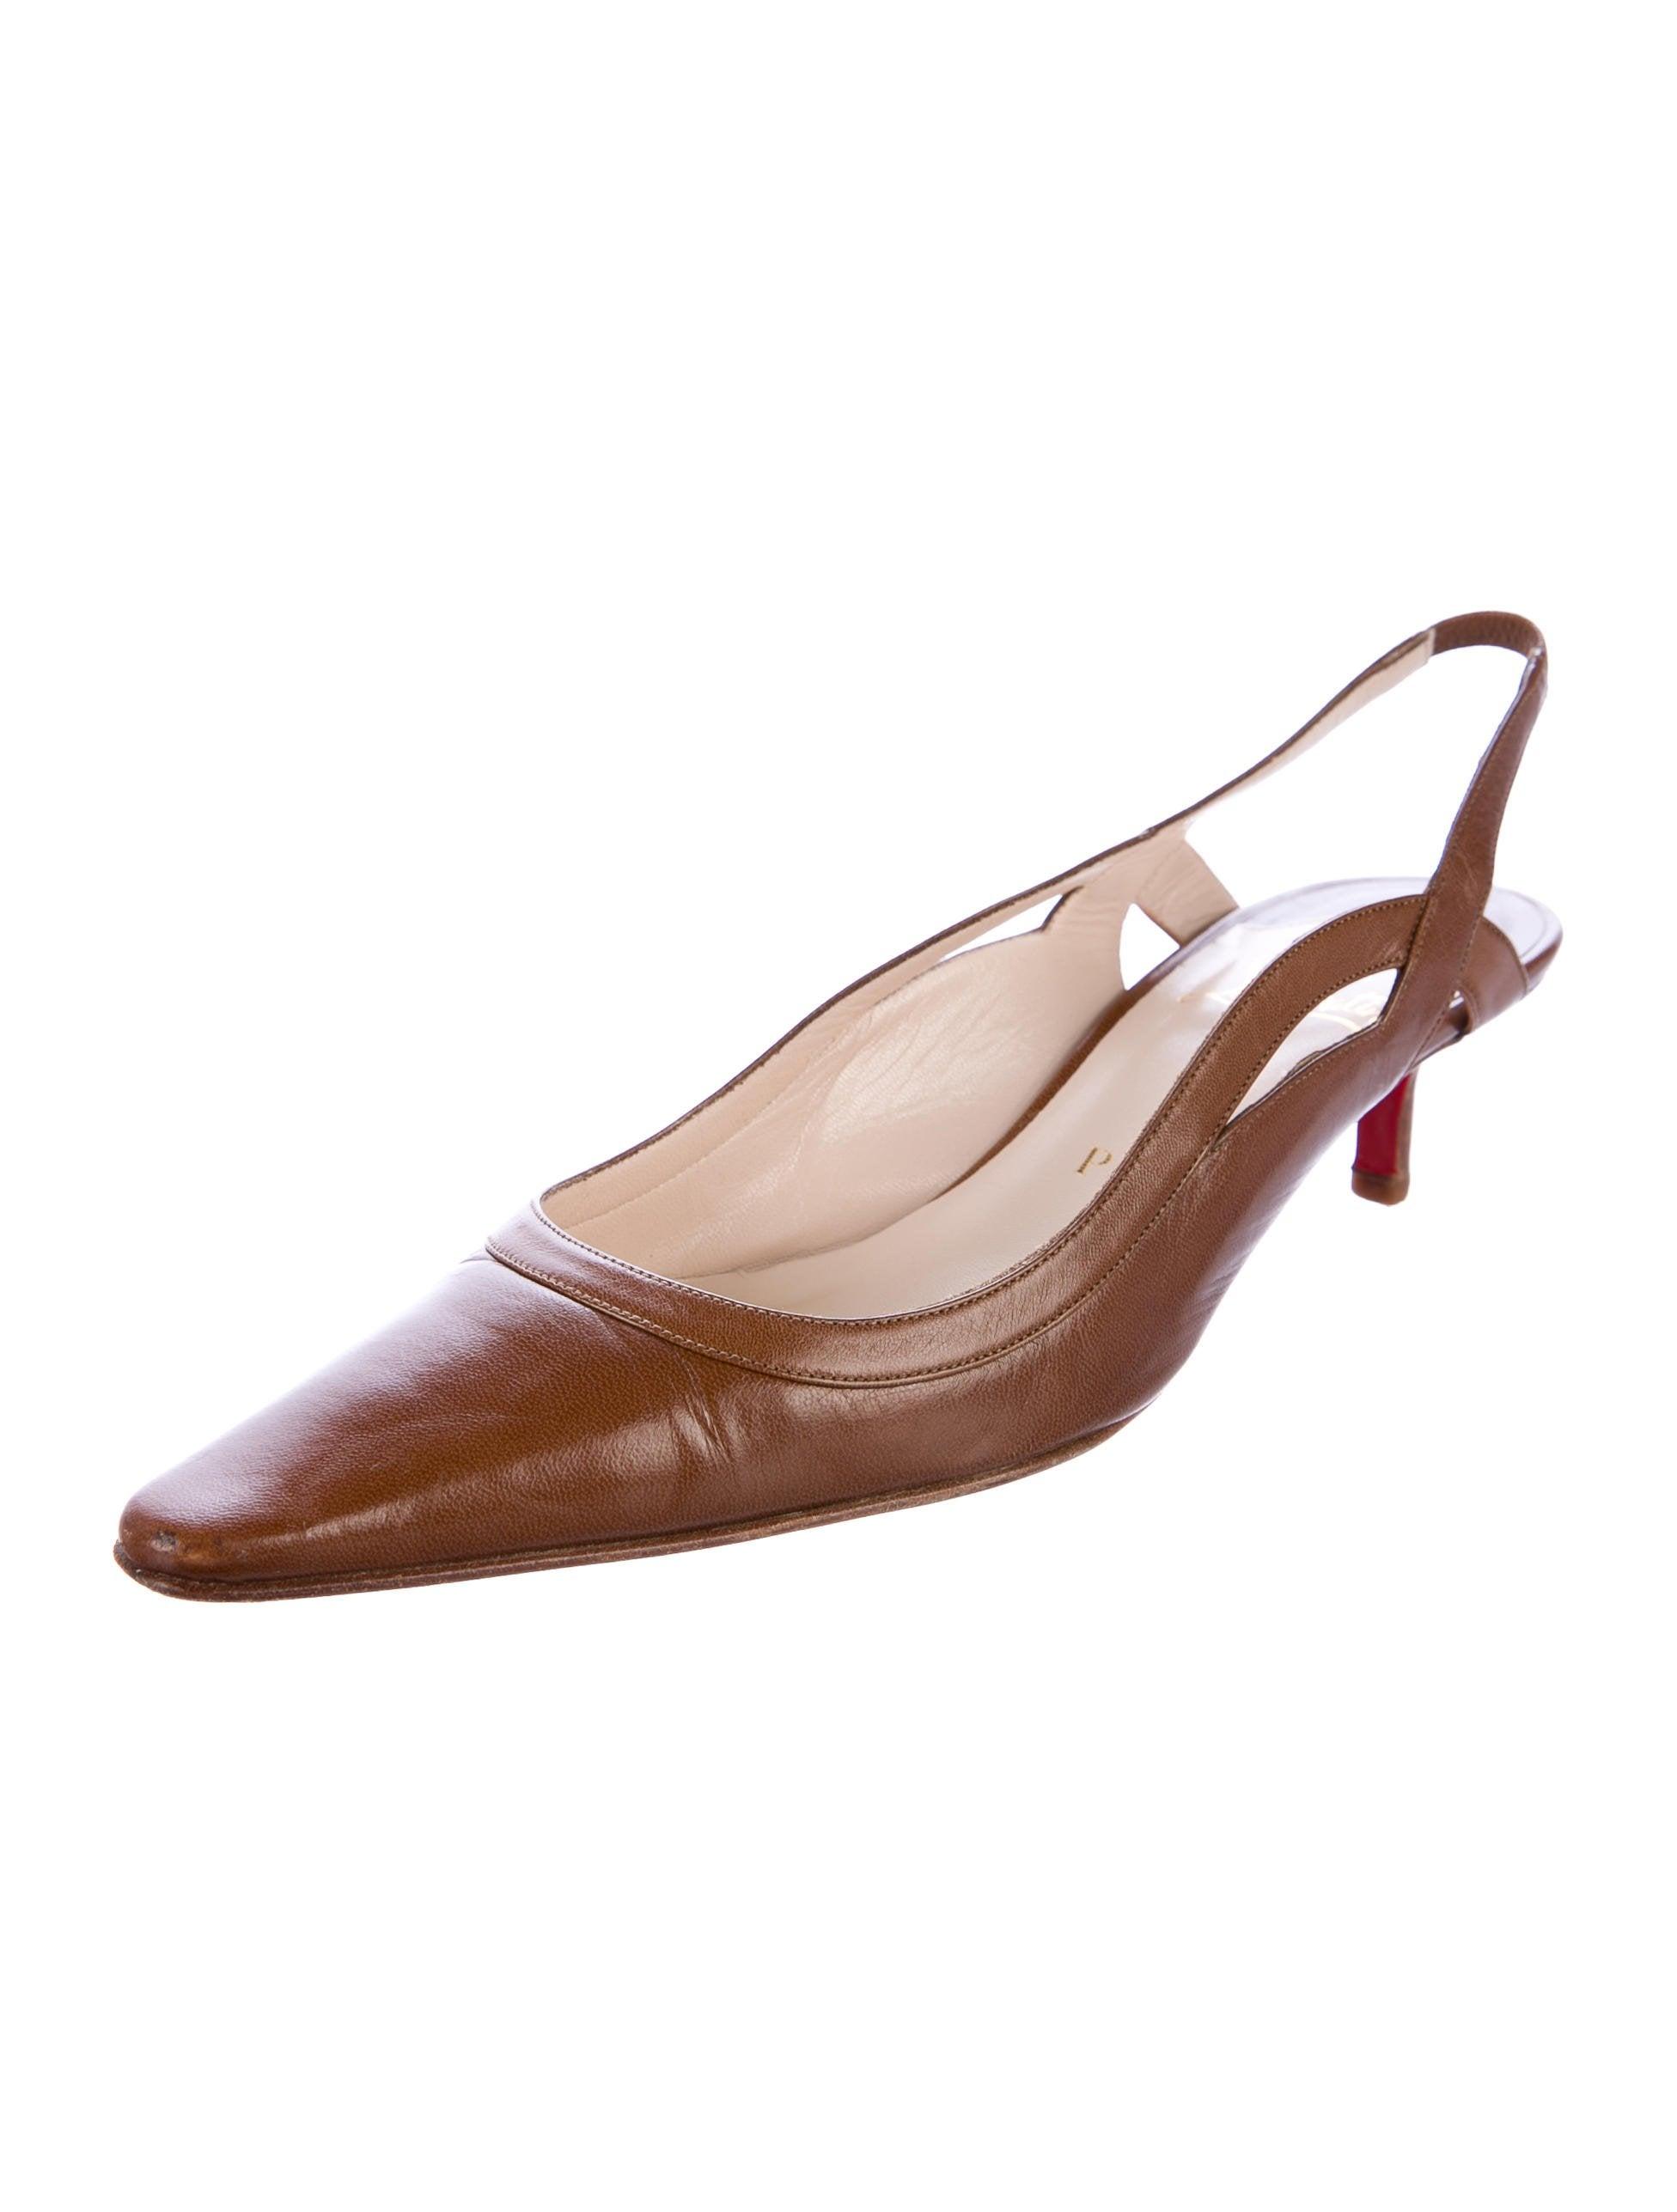 Christian Louboutin Leather Slingback Pumps Shoes